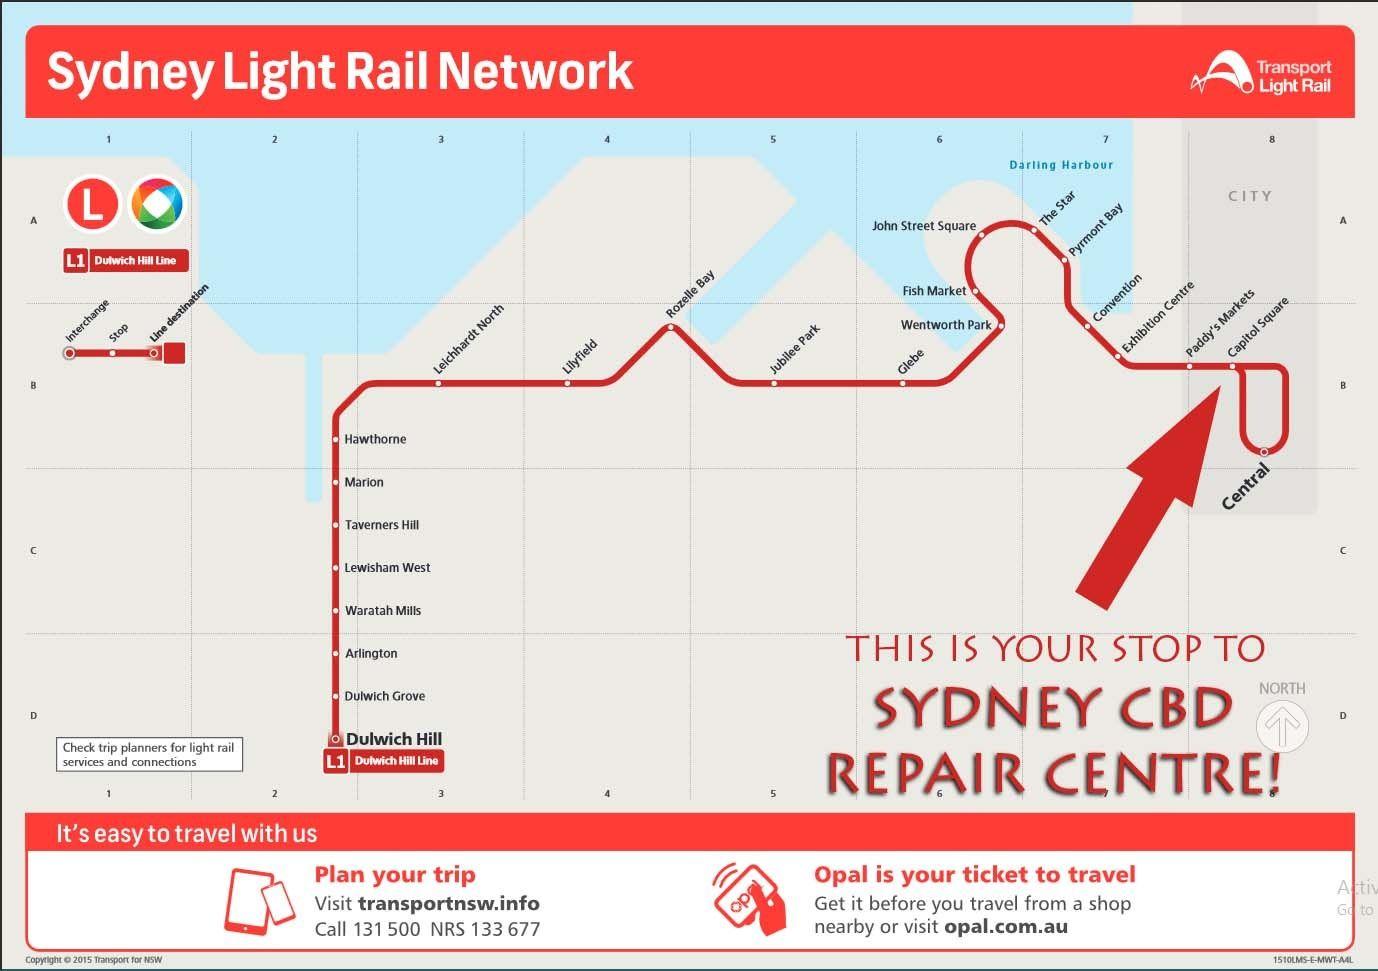 light rail sydney cbd accommodation - photo#21